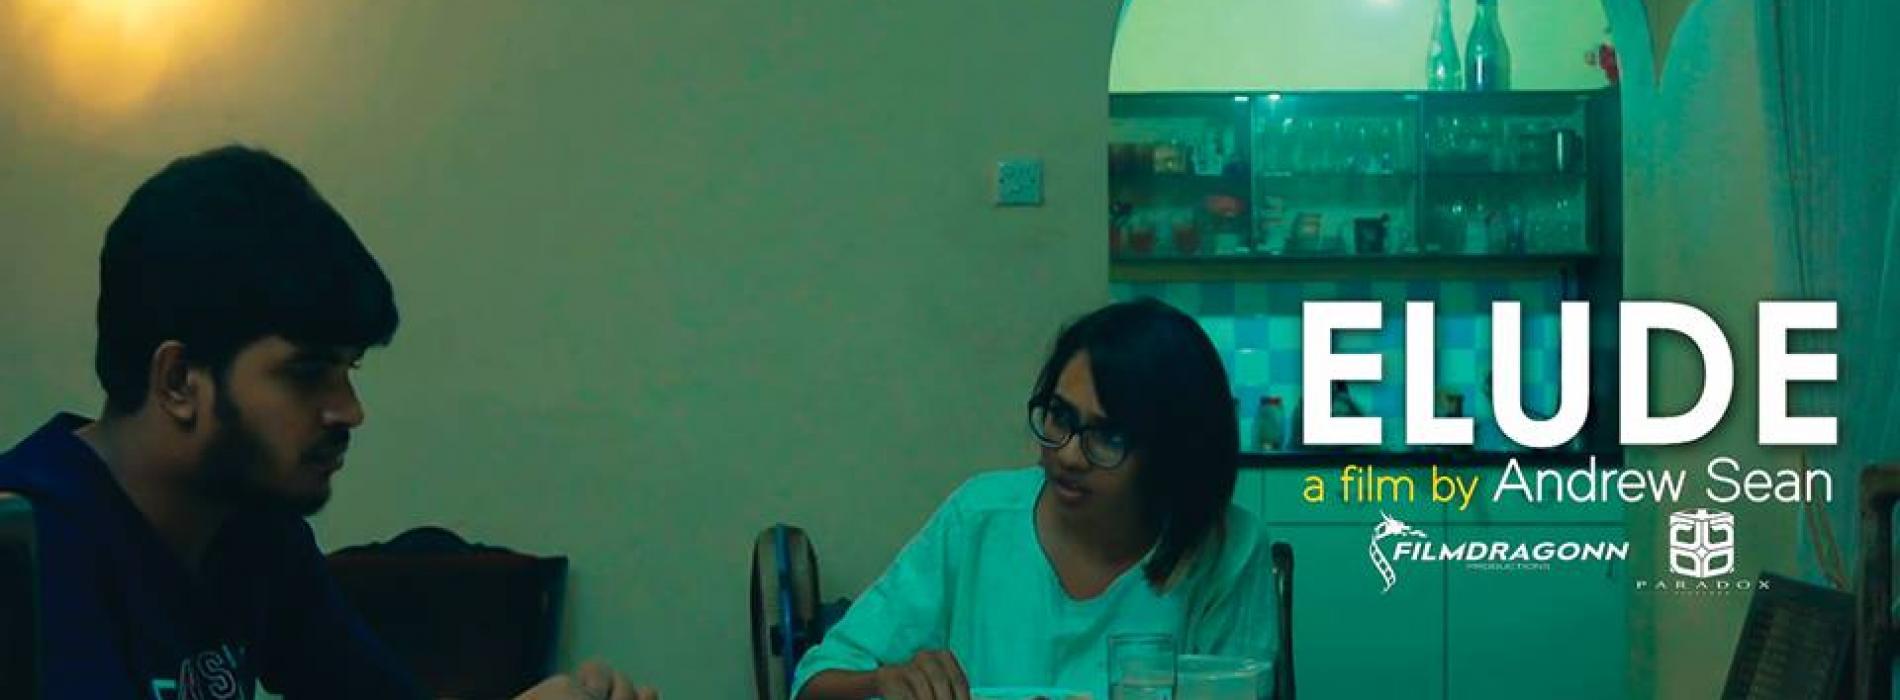 Elude : The Short Film